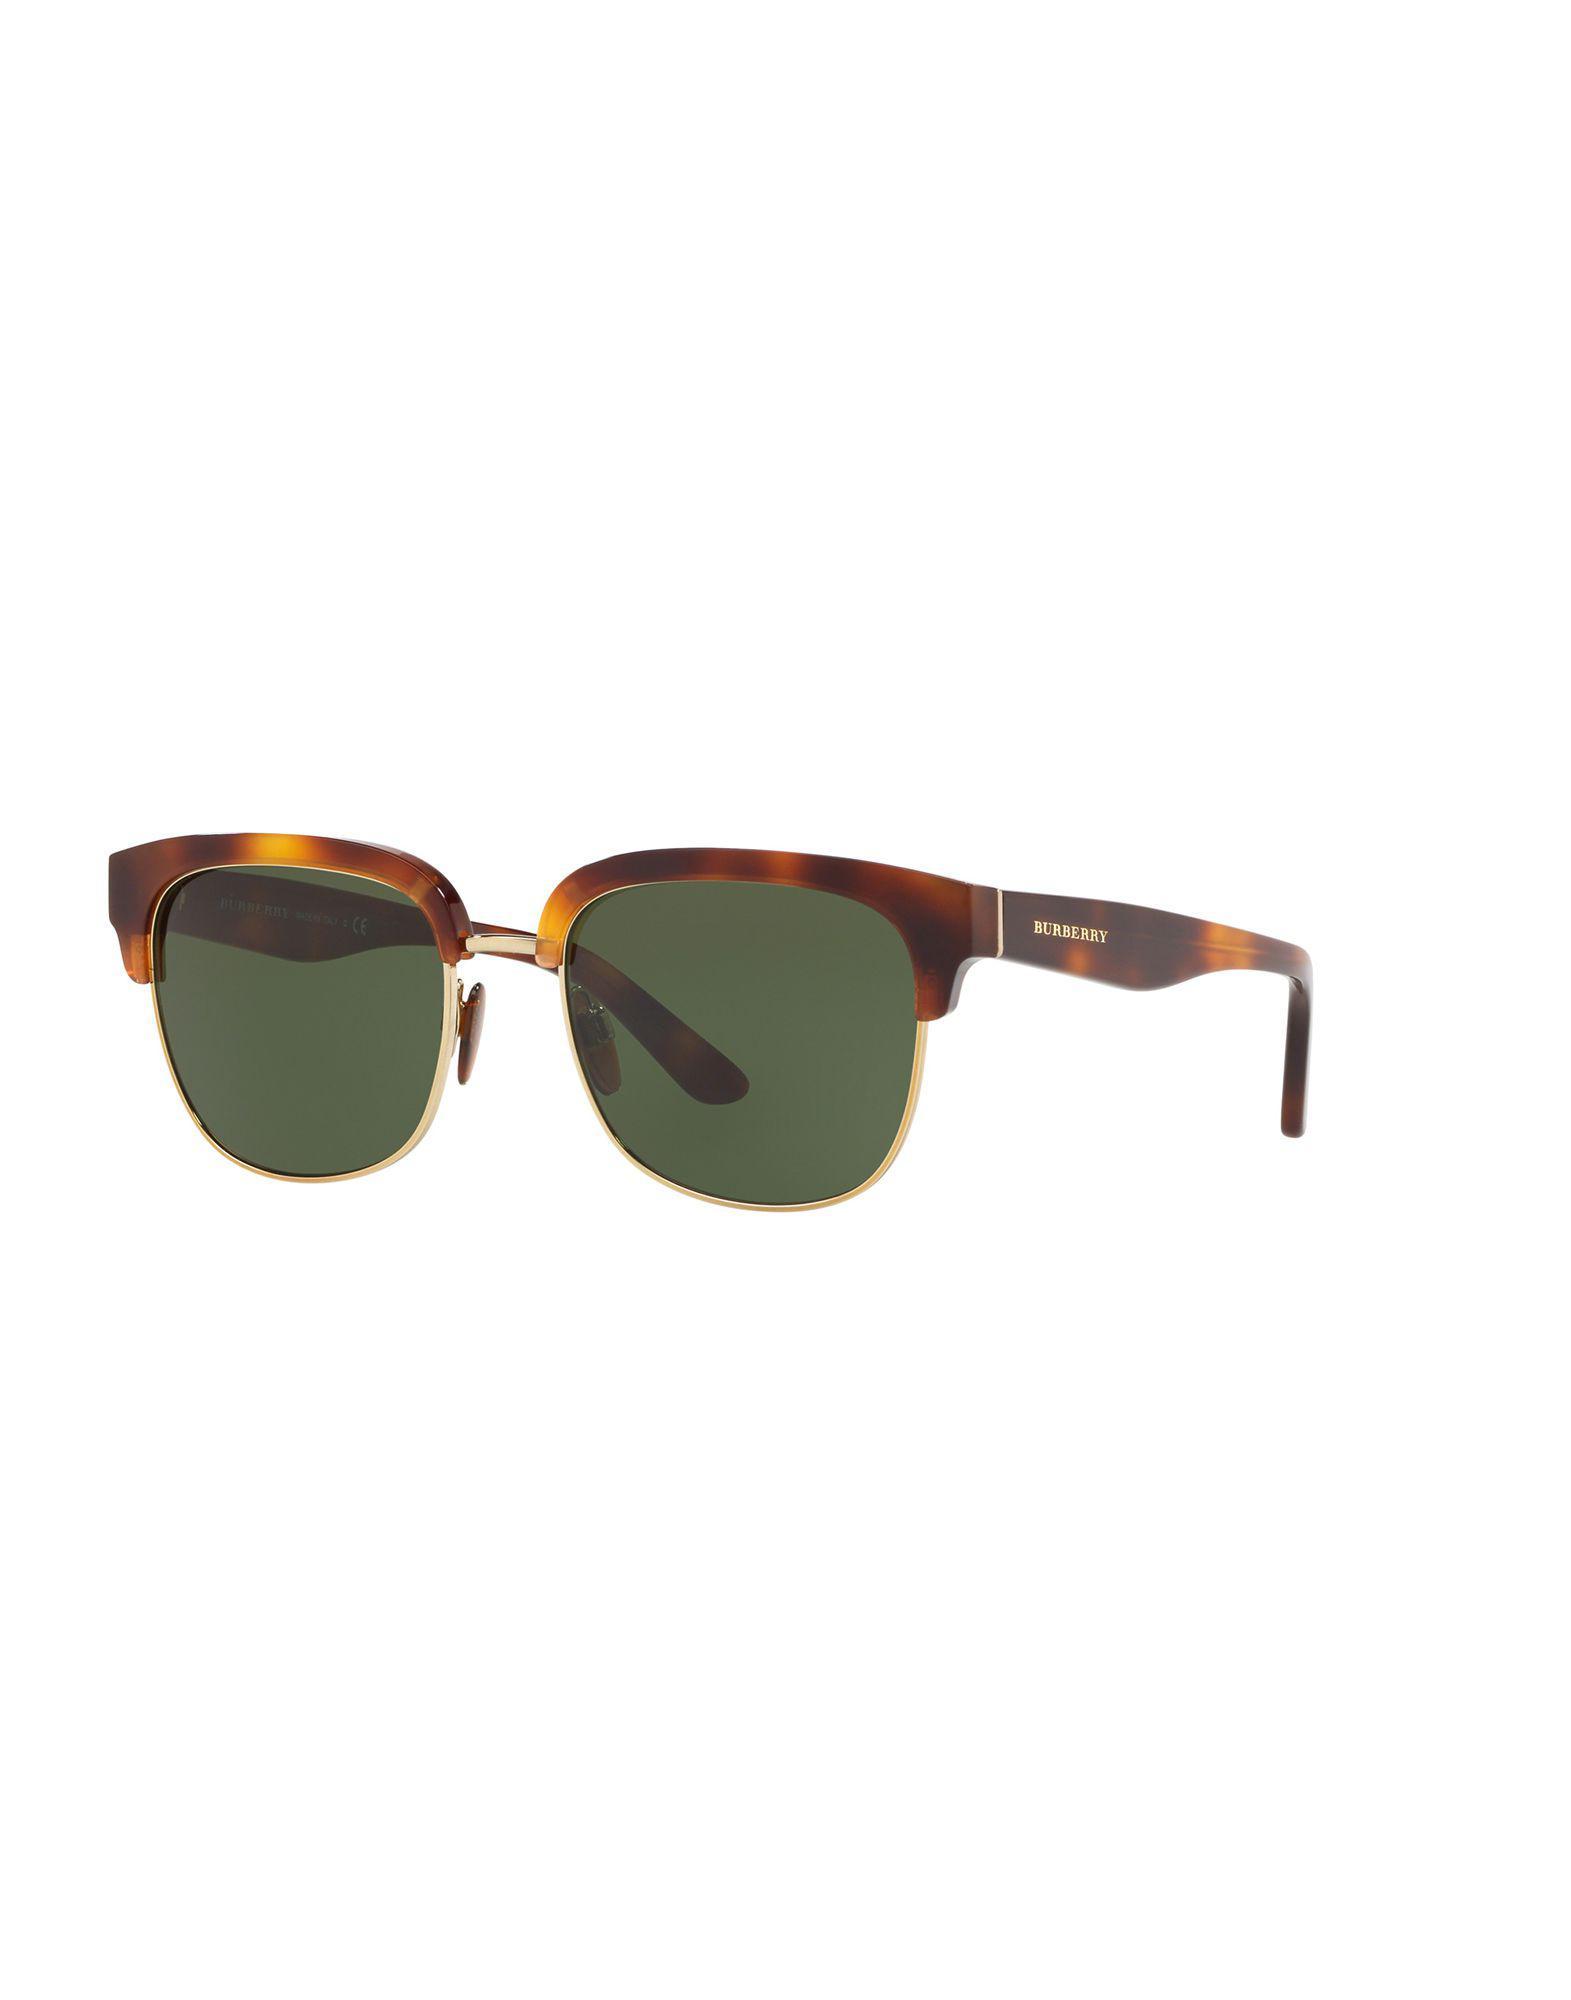 a1d4ffaf1b7 Burberry - Brown Sunglasses for Men - Lyst. View fullscreen